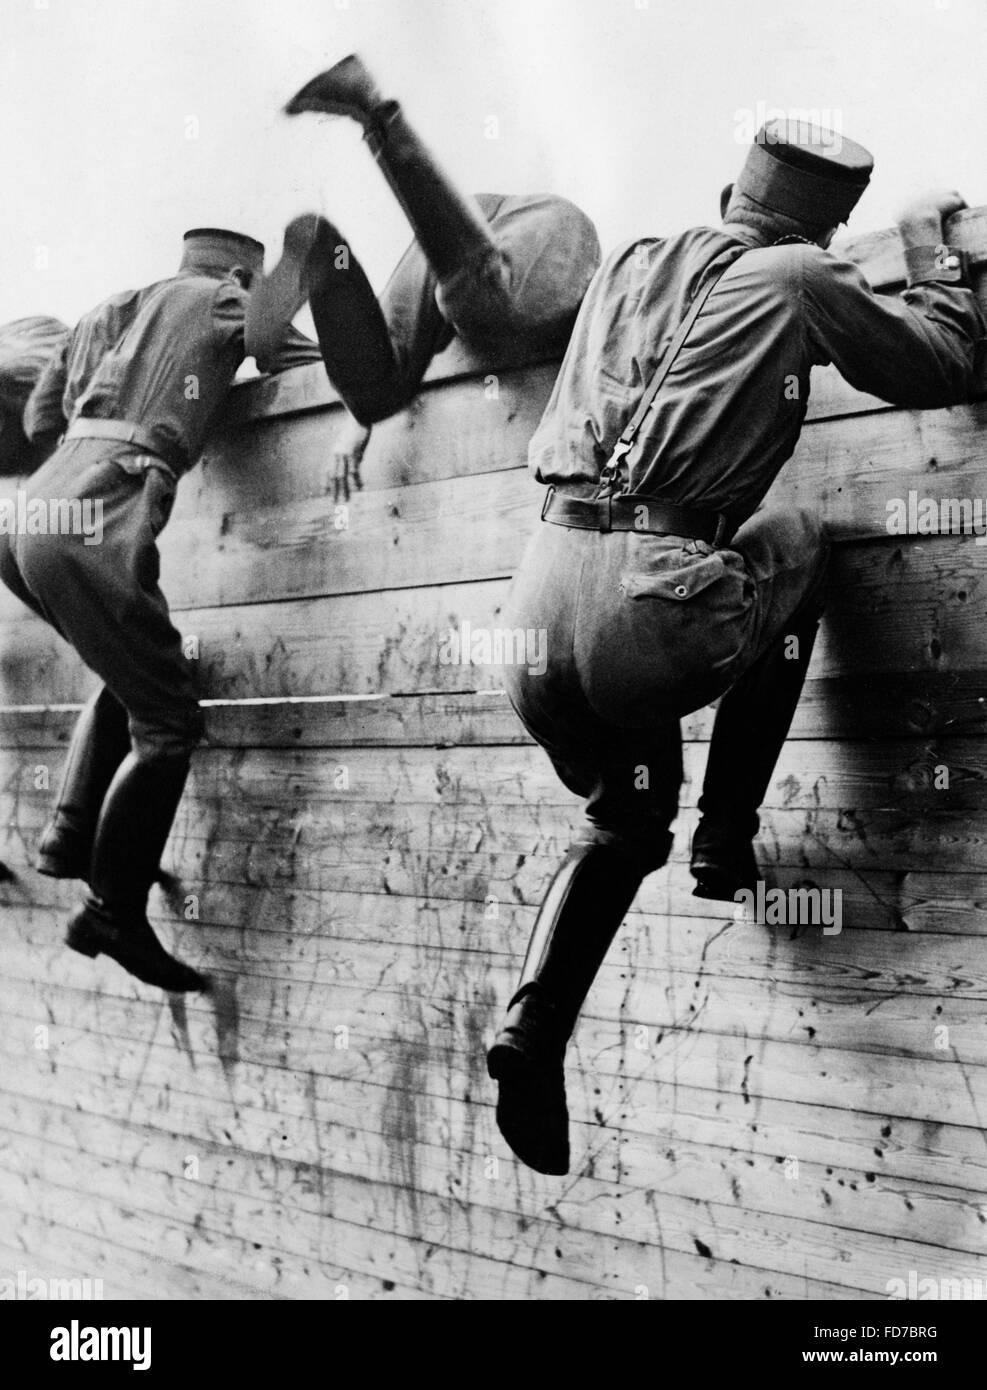 SA men climbing a wall, undated - Stock Image